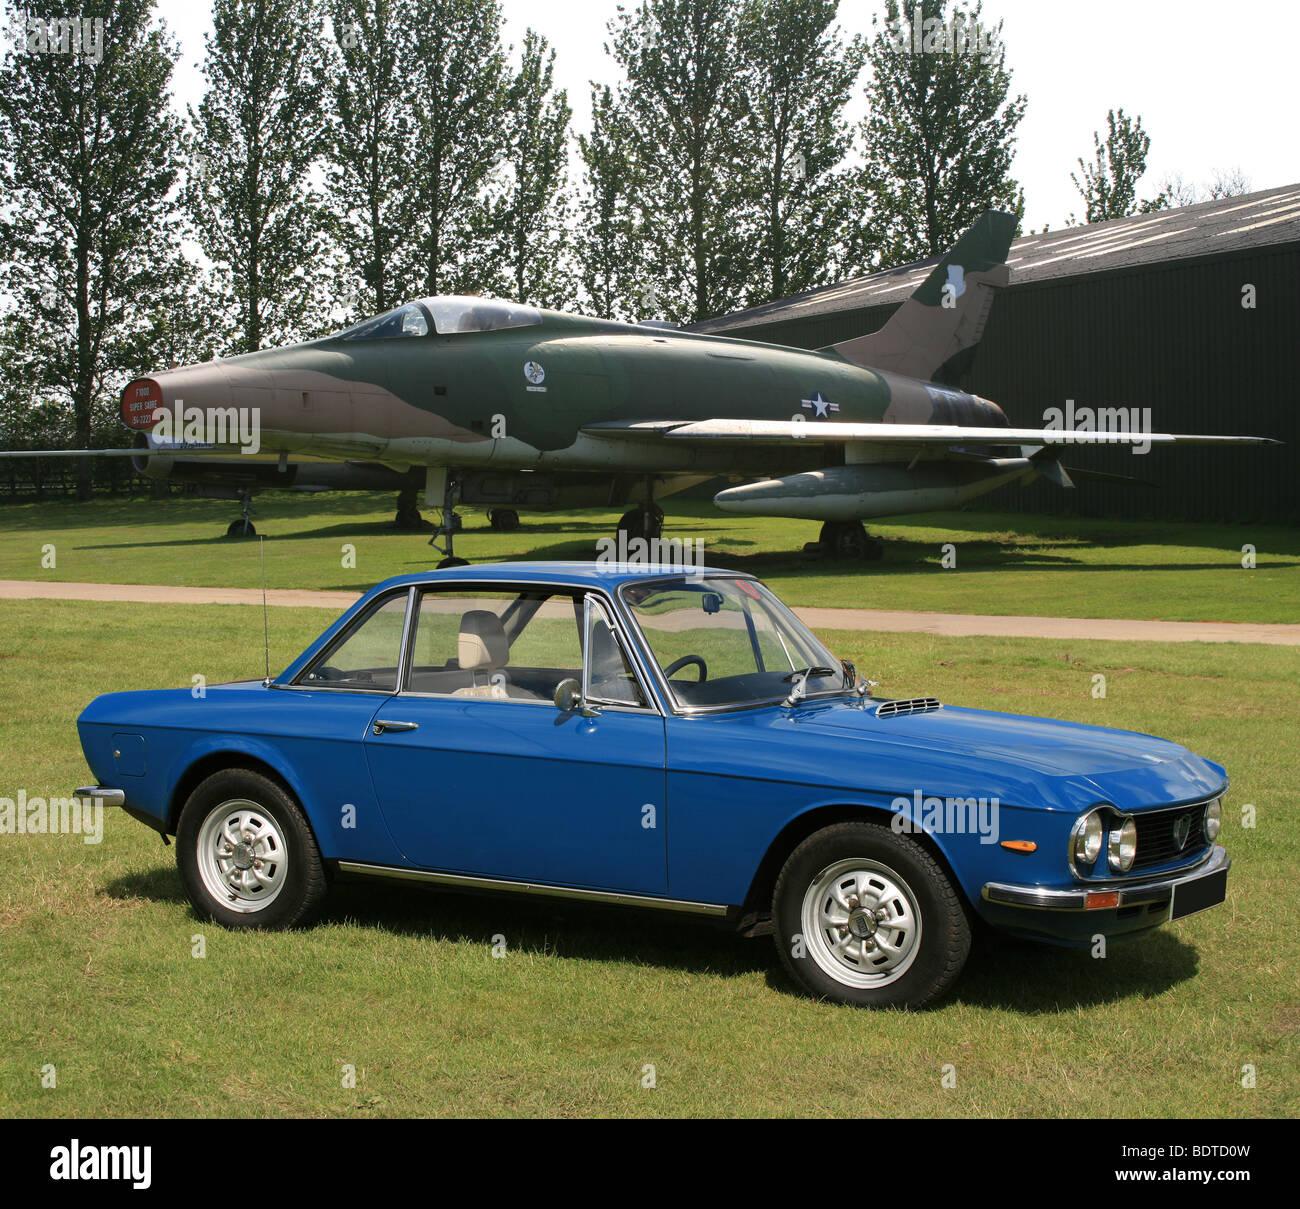 Lancia Fulvia - Stock Image